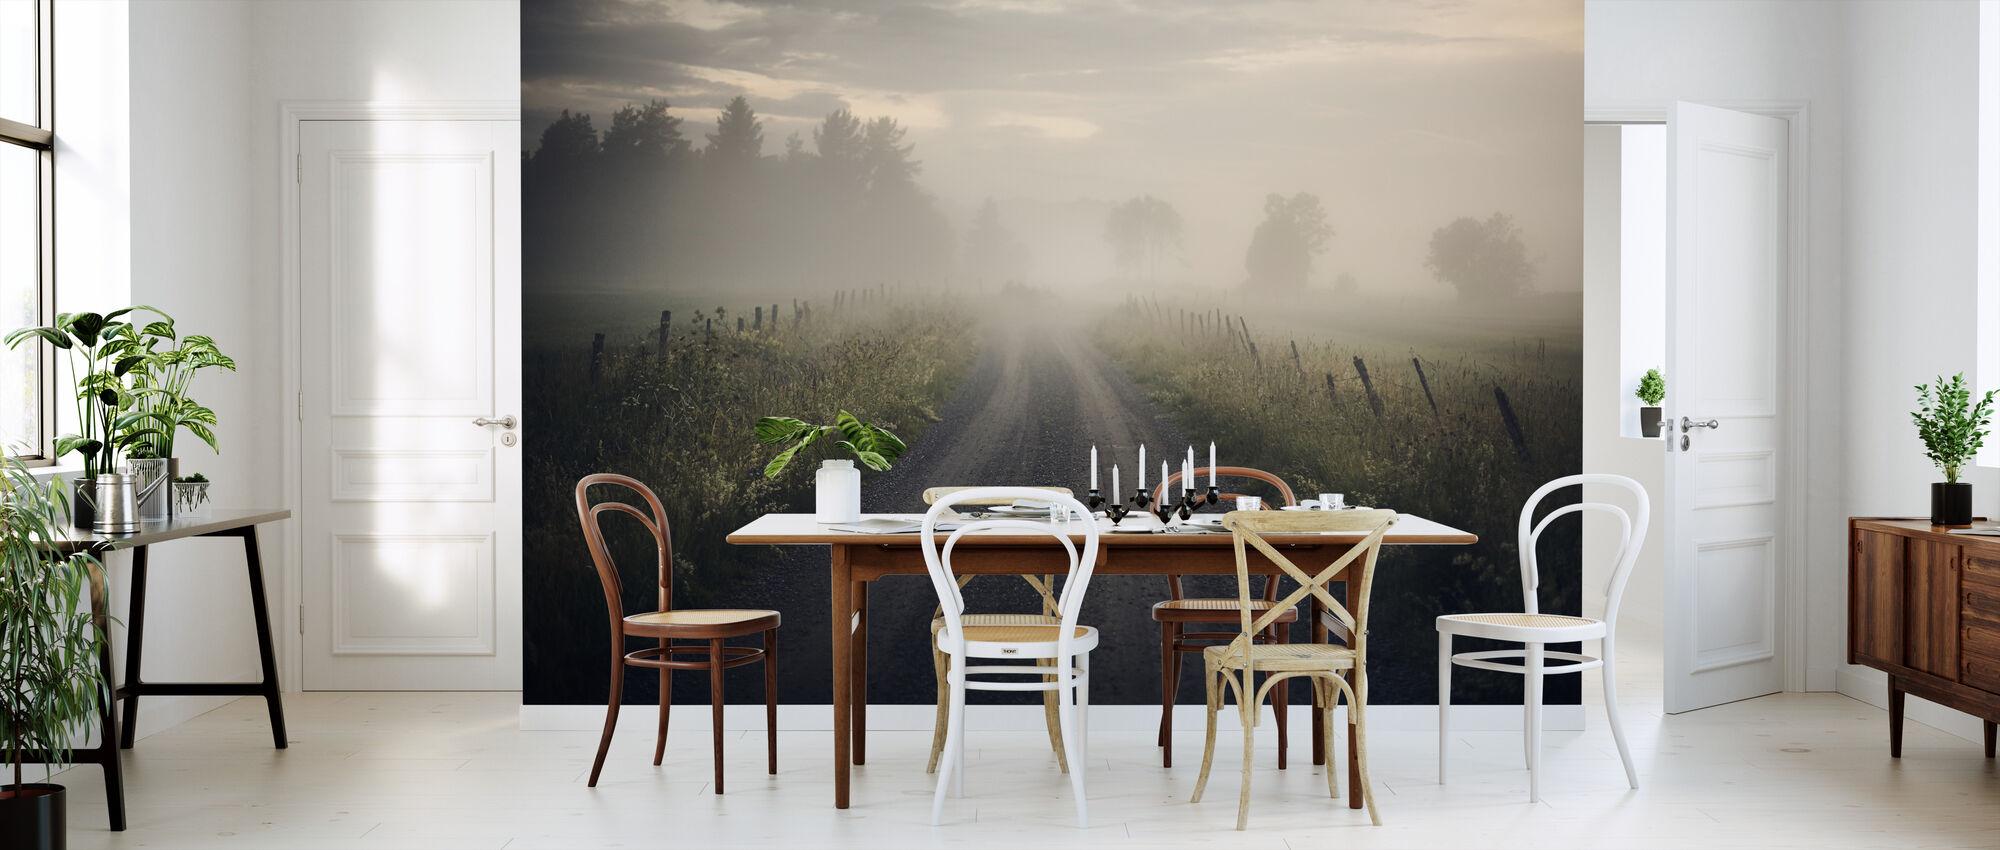 Misty Landelijke Weg - Behang - Keuken